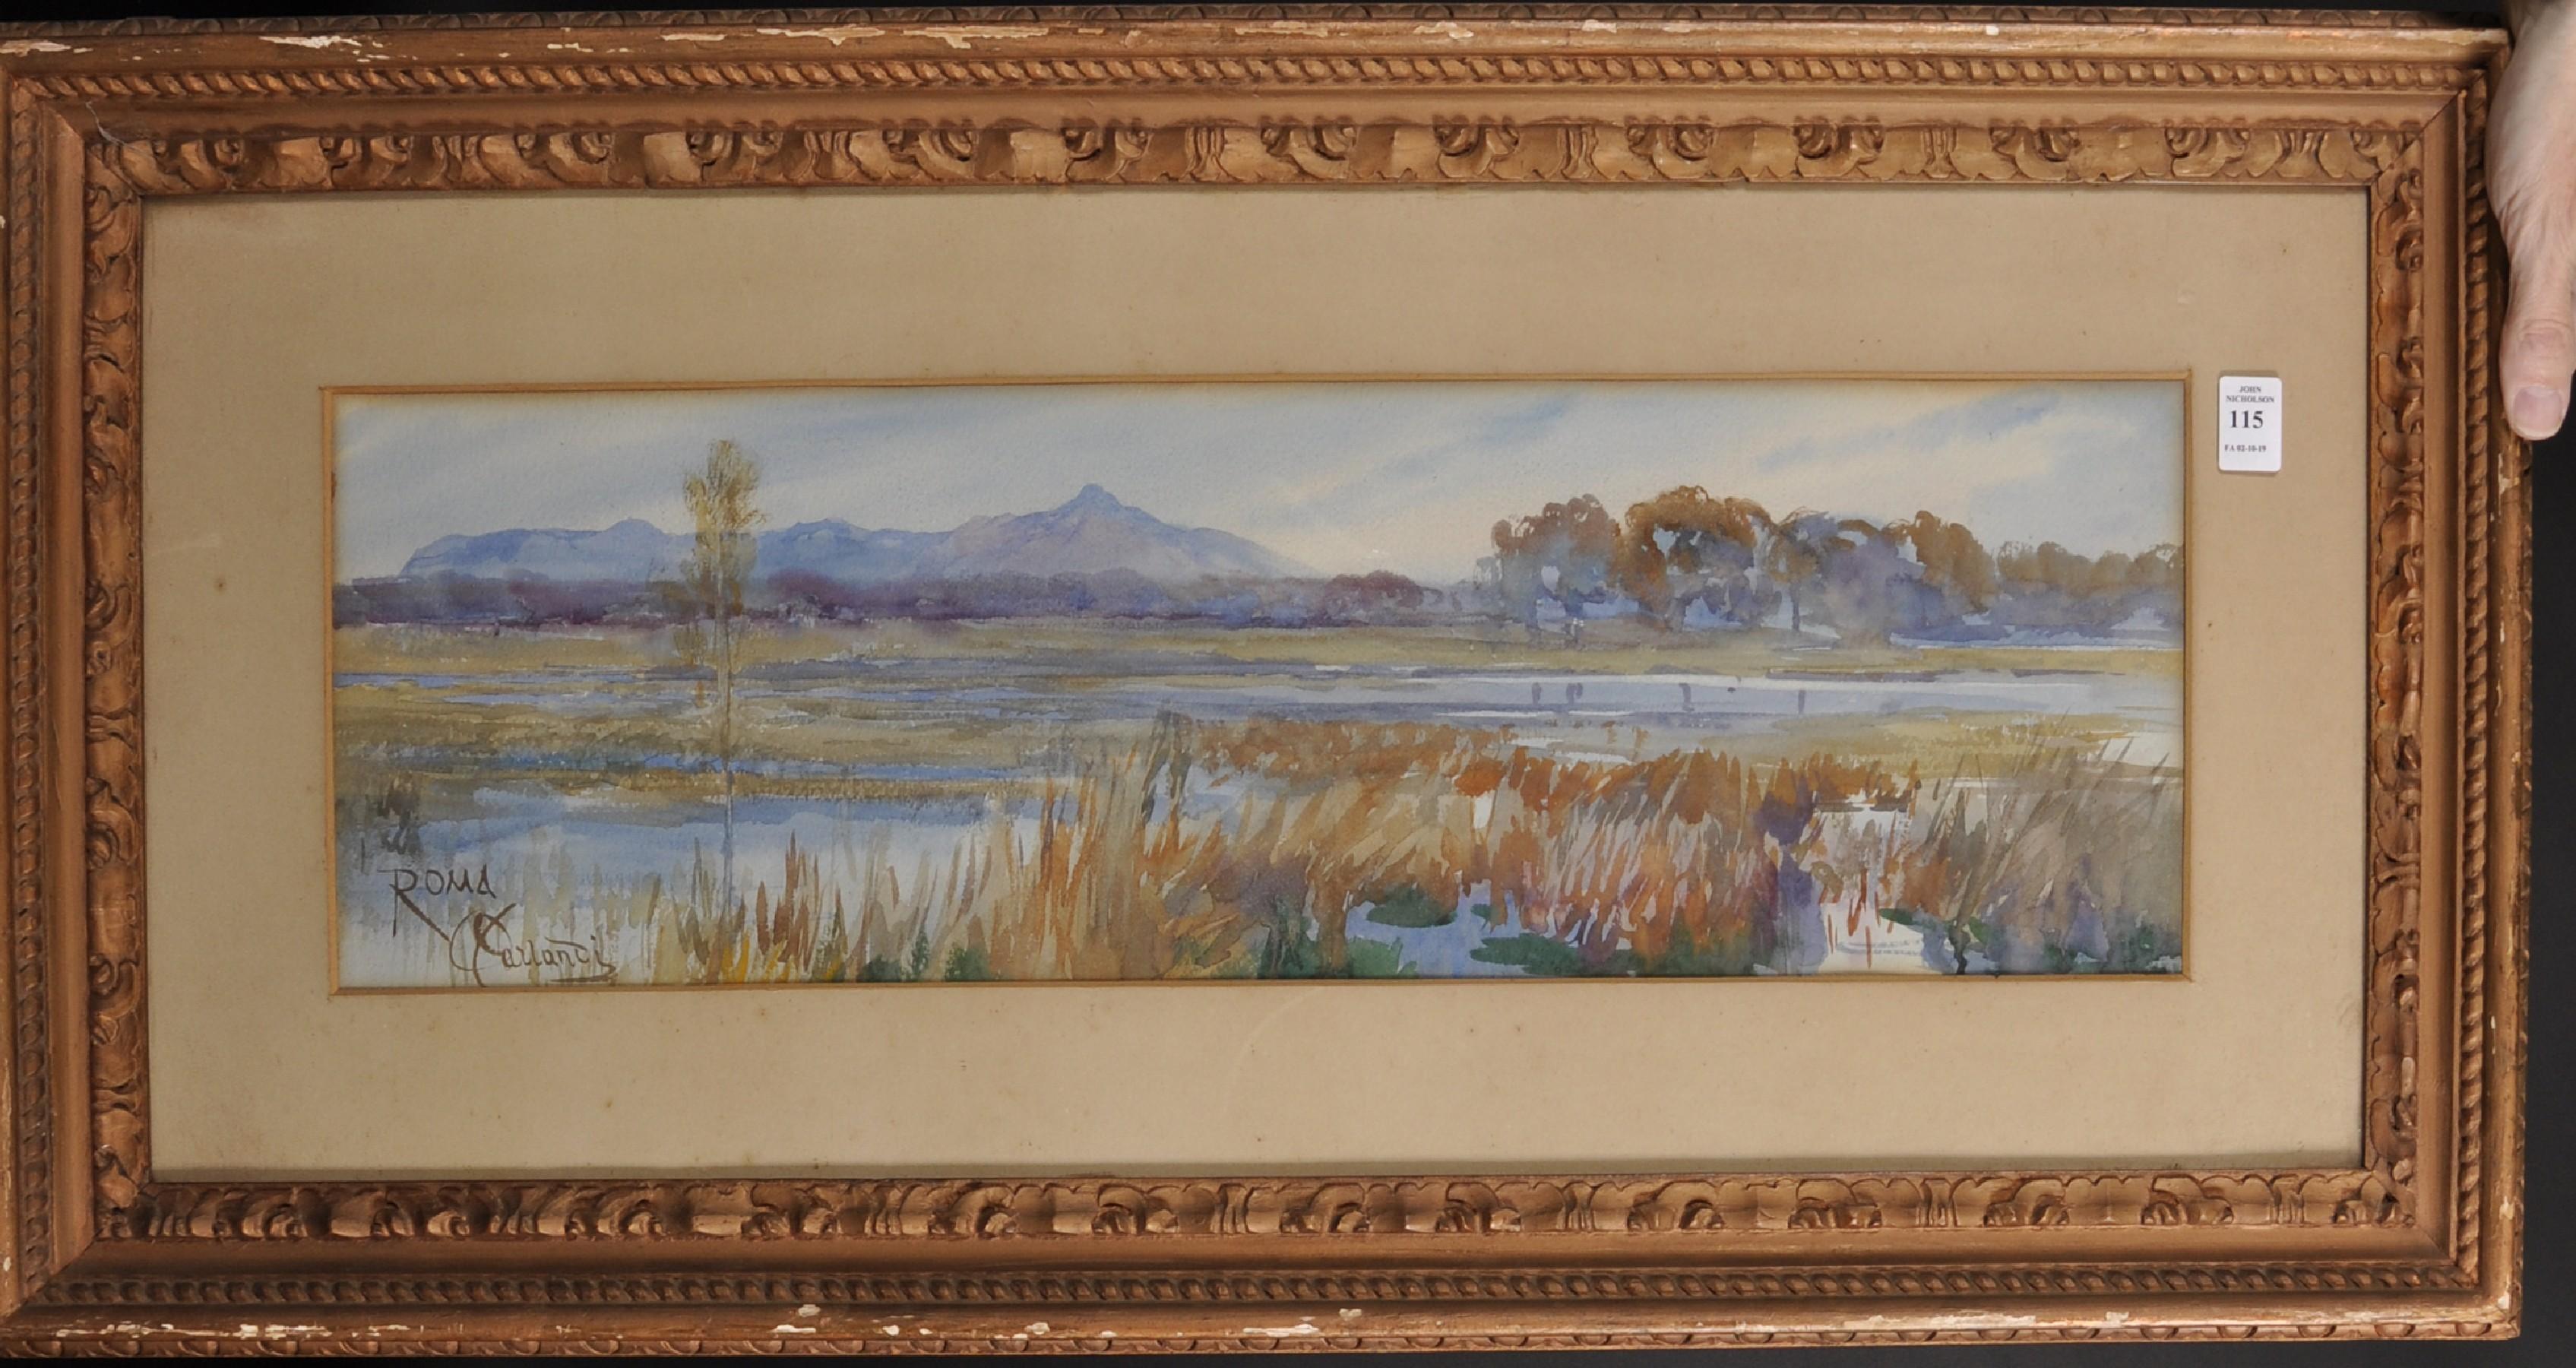 Onorato Carlandi (1848-1939) Italian. A River Landscape, Watercolour, Signed and Inscribed 'Roma', - Image 2 of 4